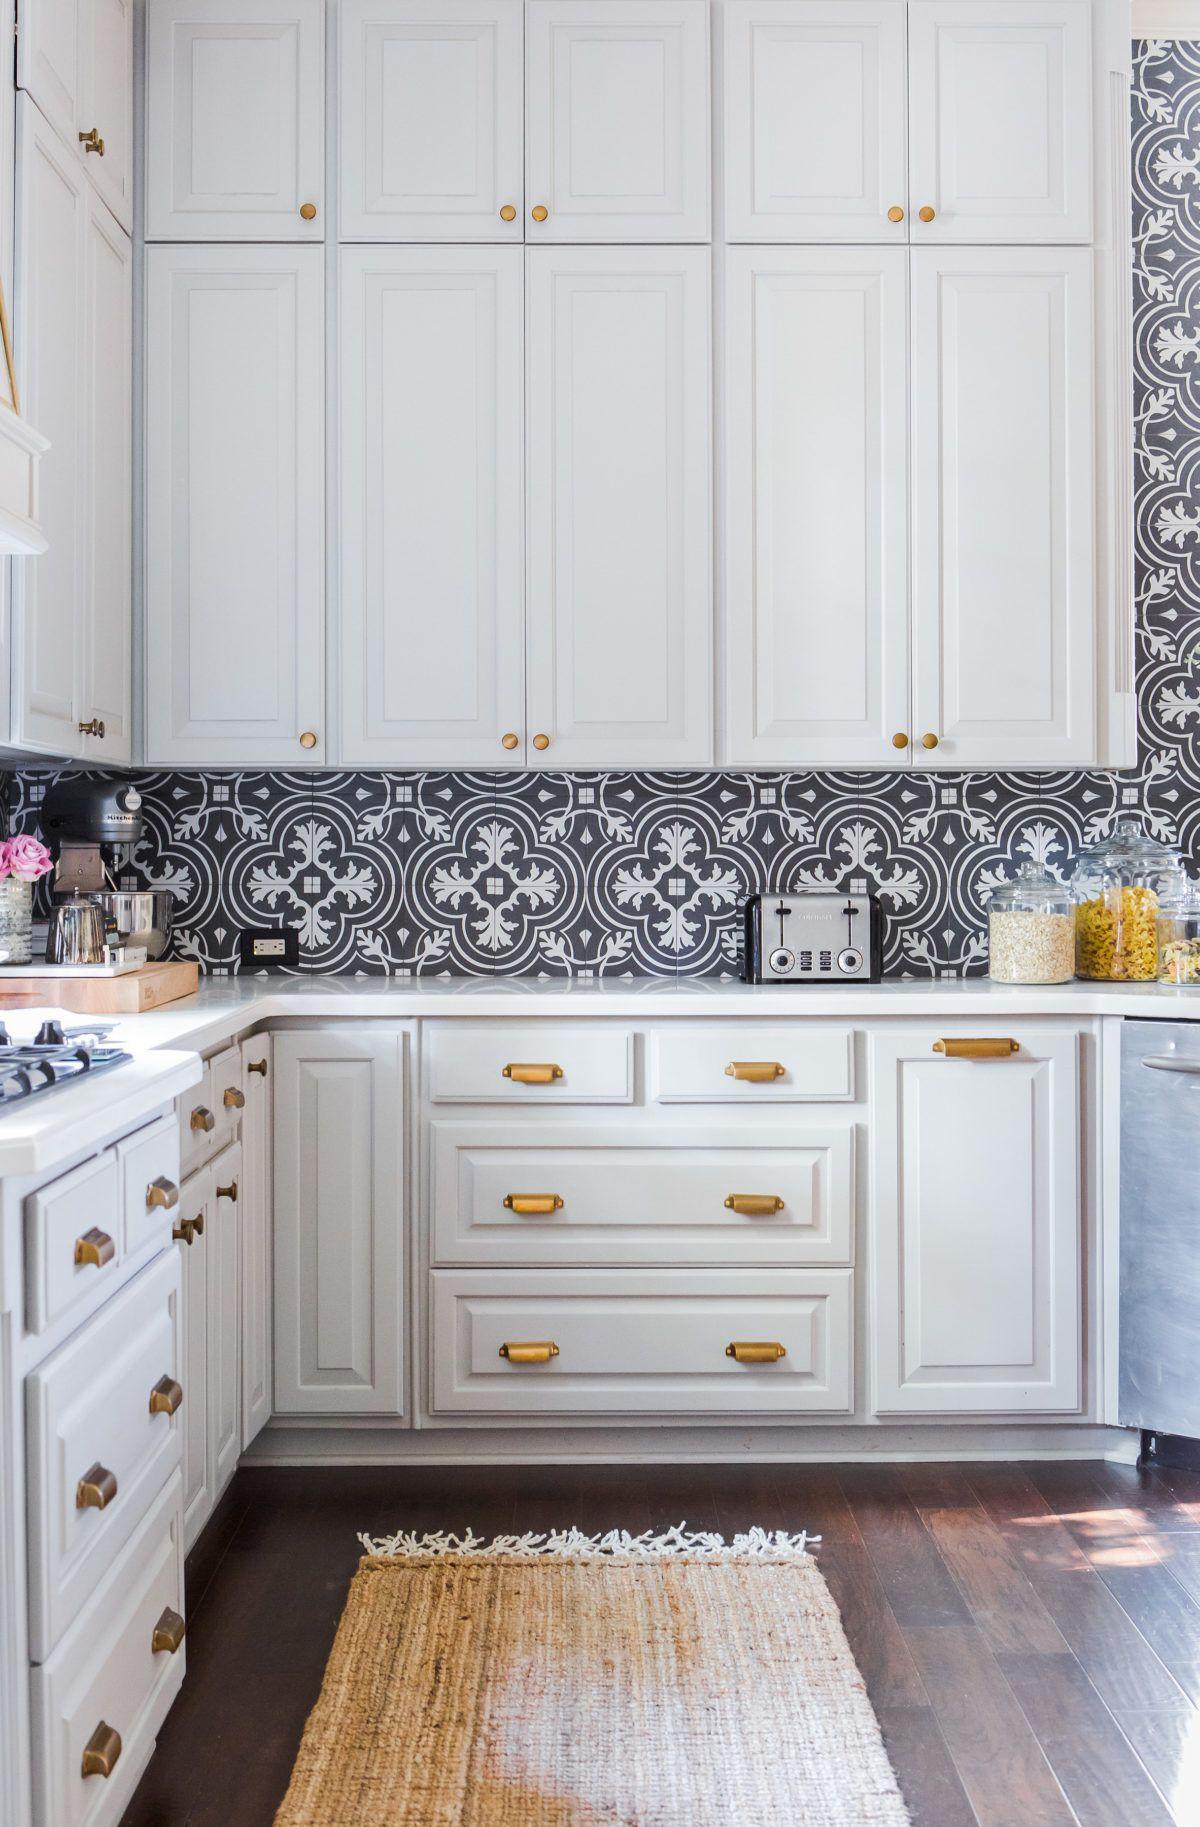 Kitchen The Renovation Reveal Hi Sugarplum Pottery Barn Kitchen Kitchen Remodel Kitchen Design